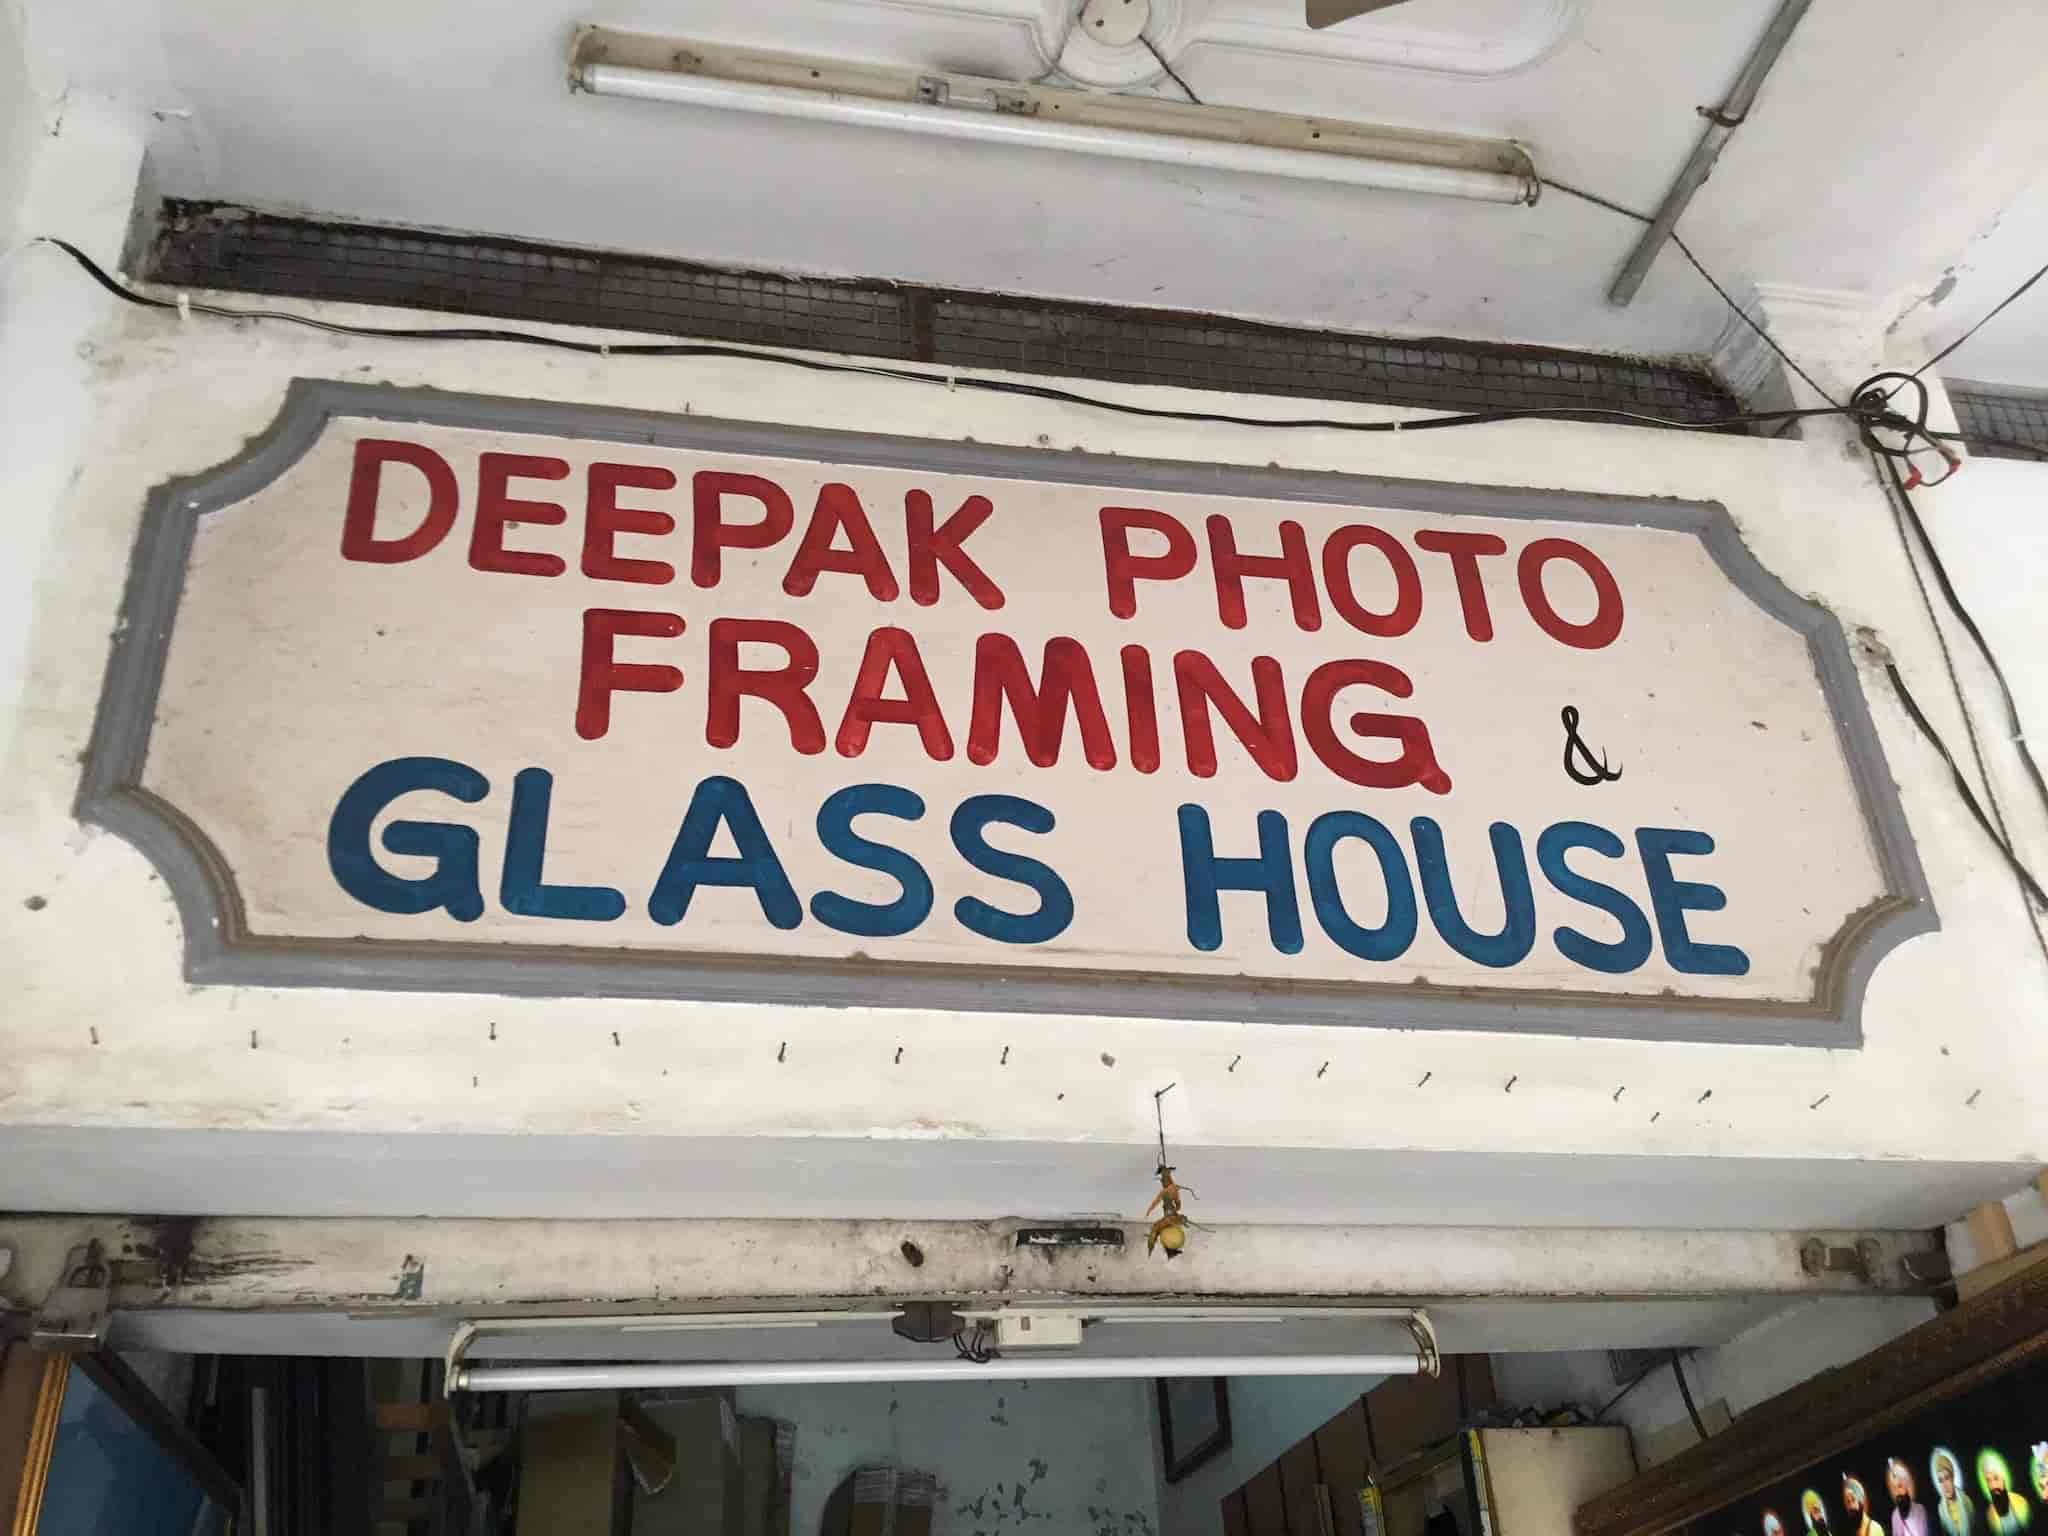 Deepak Photo Framing & Glass House, Sector 7c - Deepak Foto Framing ...